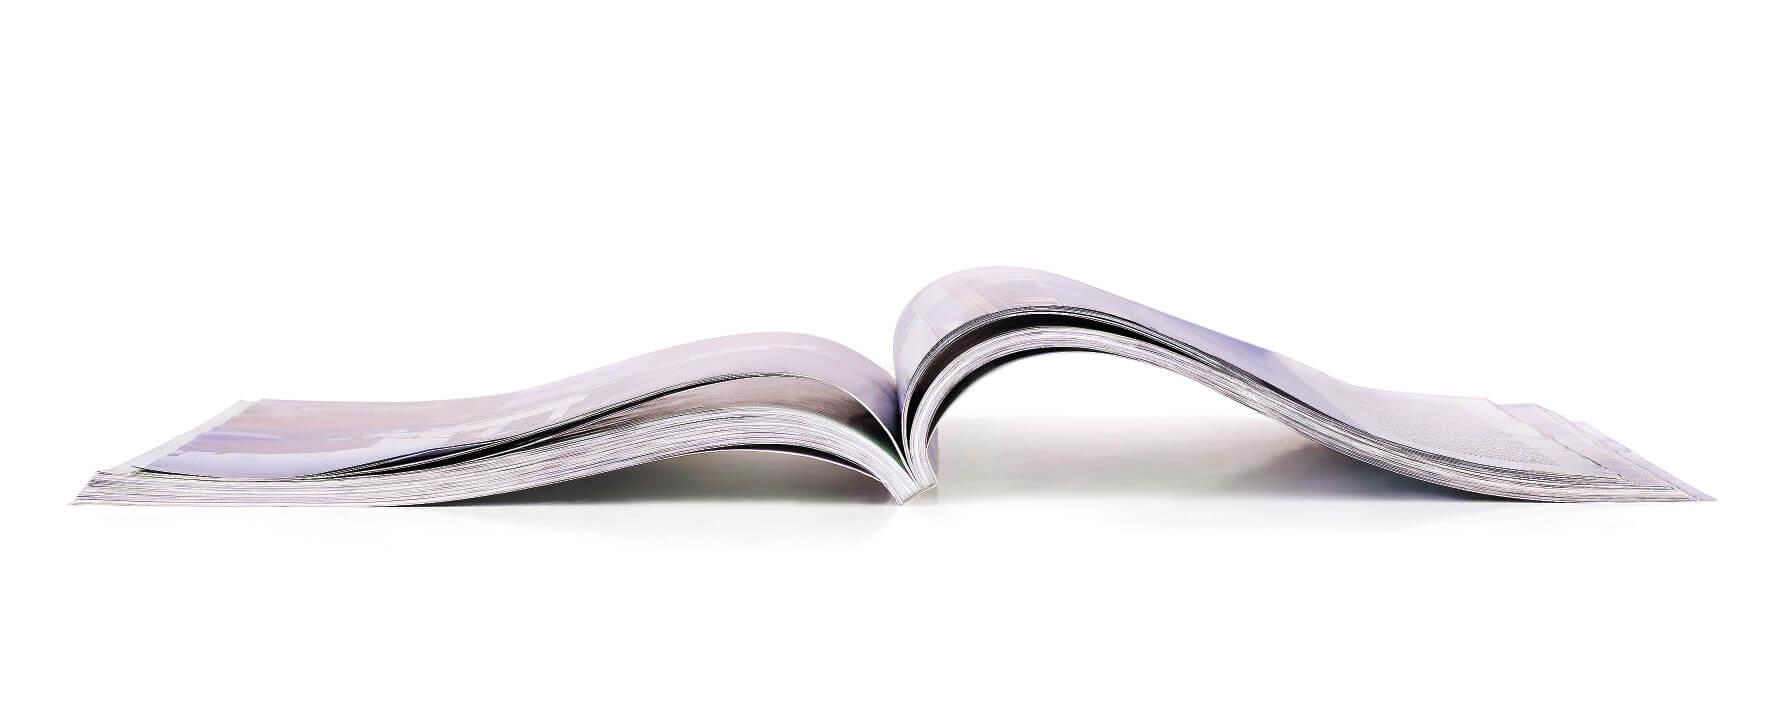 ilustracao-outro-olhar-Editorial-Fotolia_40415250